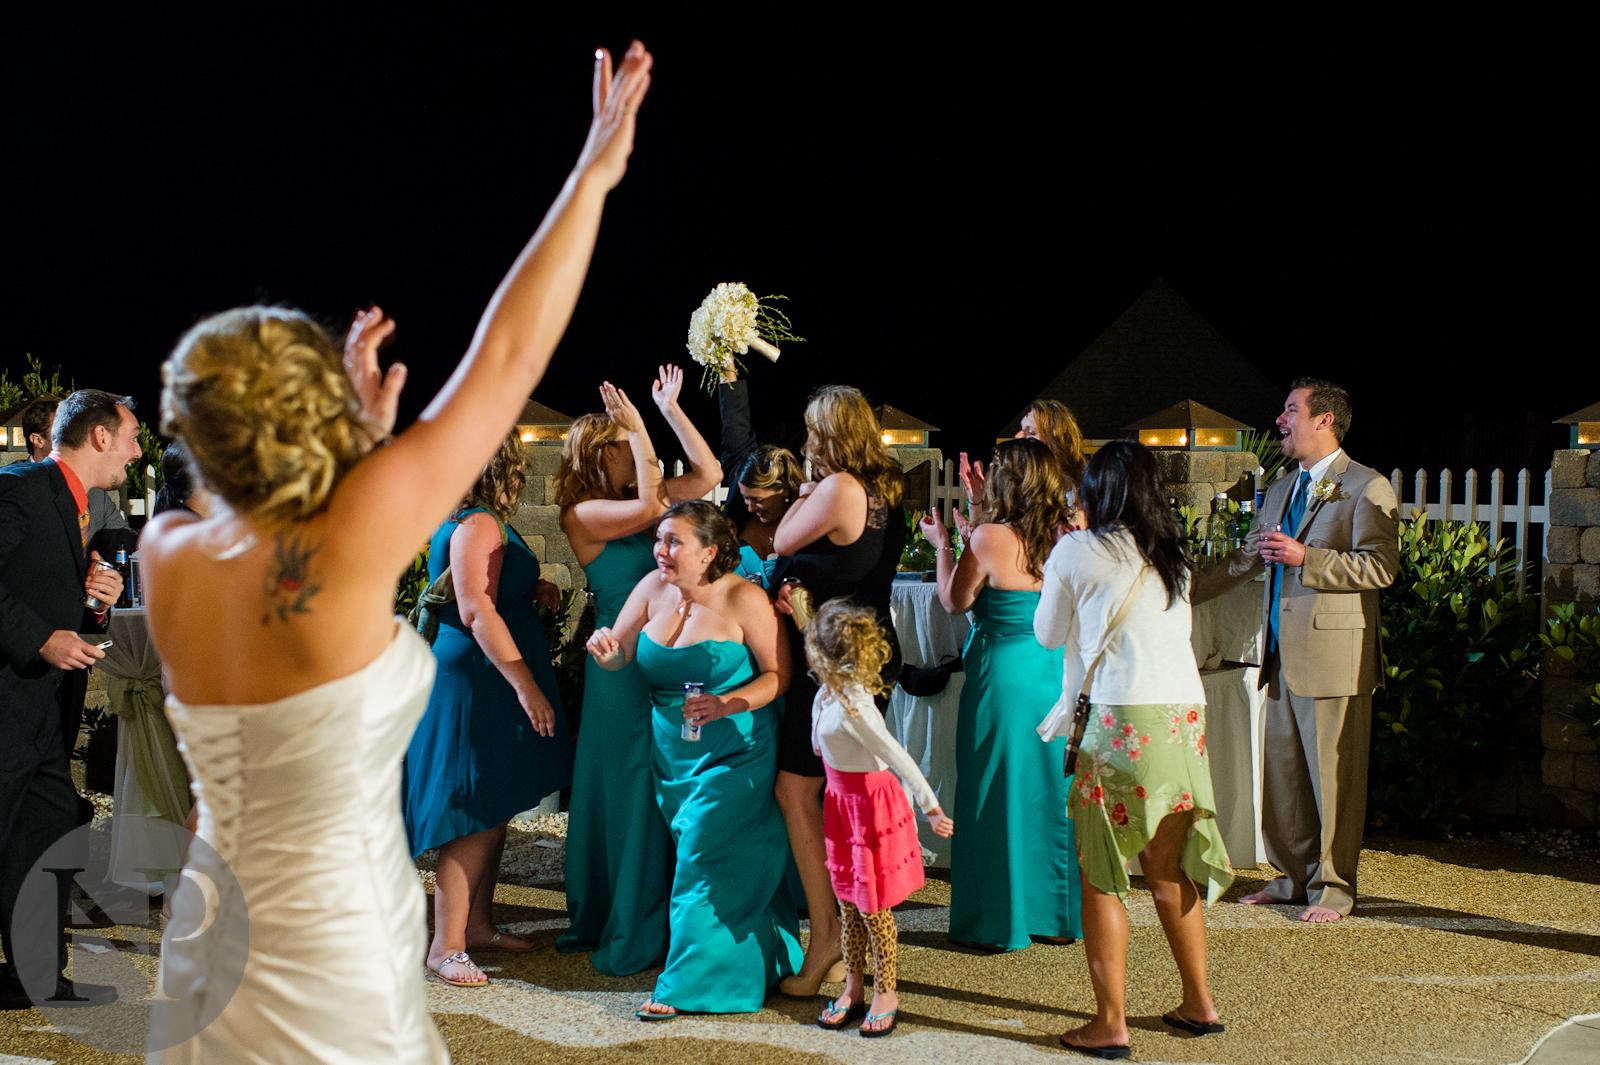 wedding photography dc photographer - district of columbia photography weddingphoto 2012_ denis kaleigh - north carolina - emerald isle - destination wedding-77.jpg